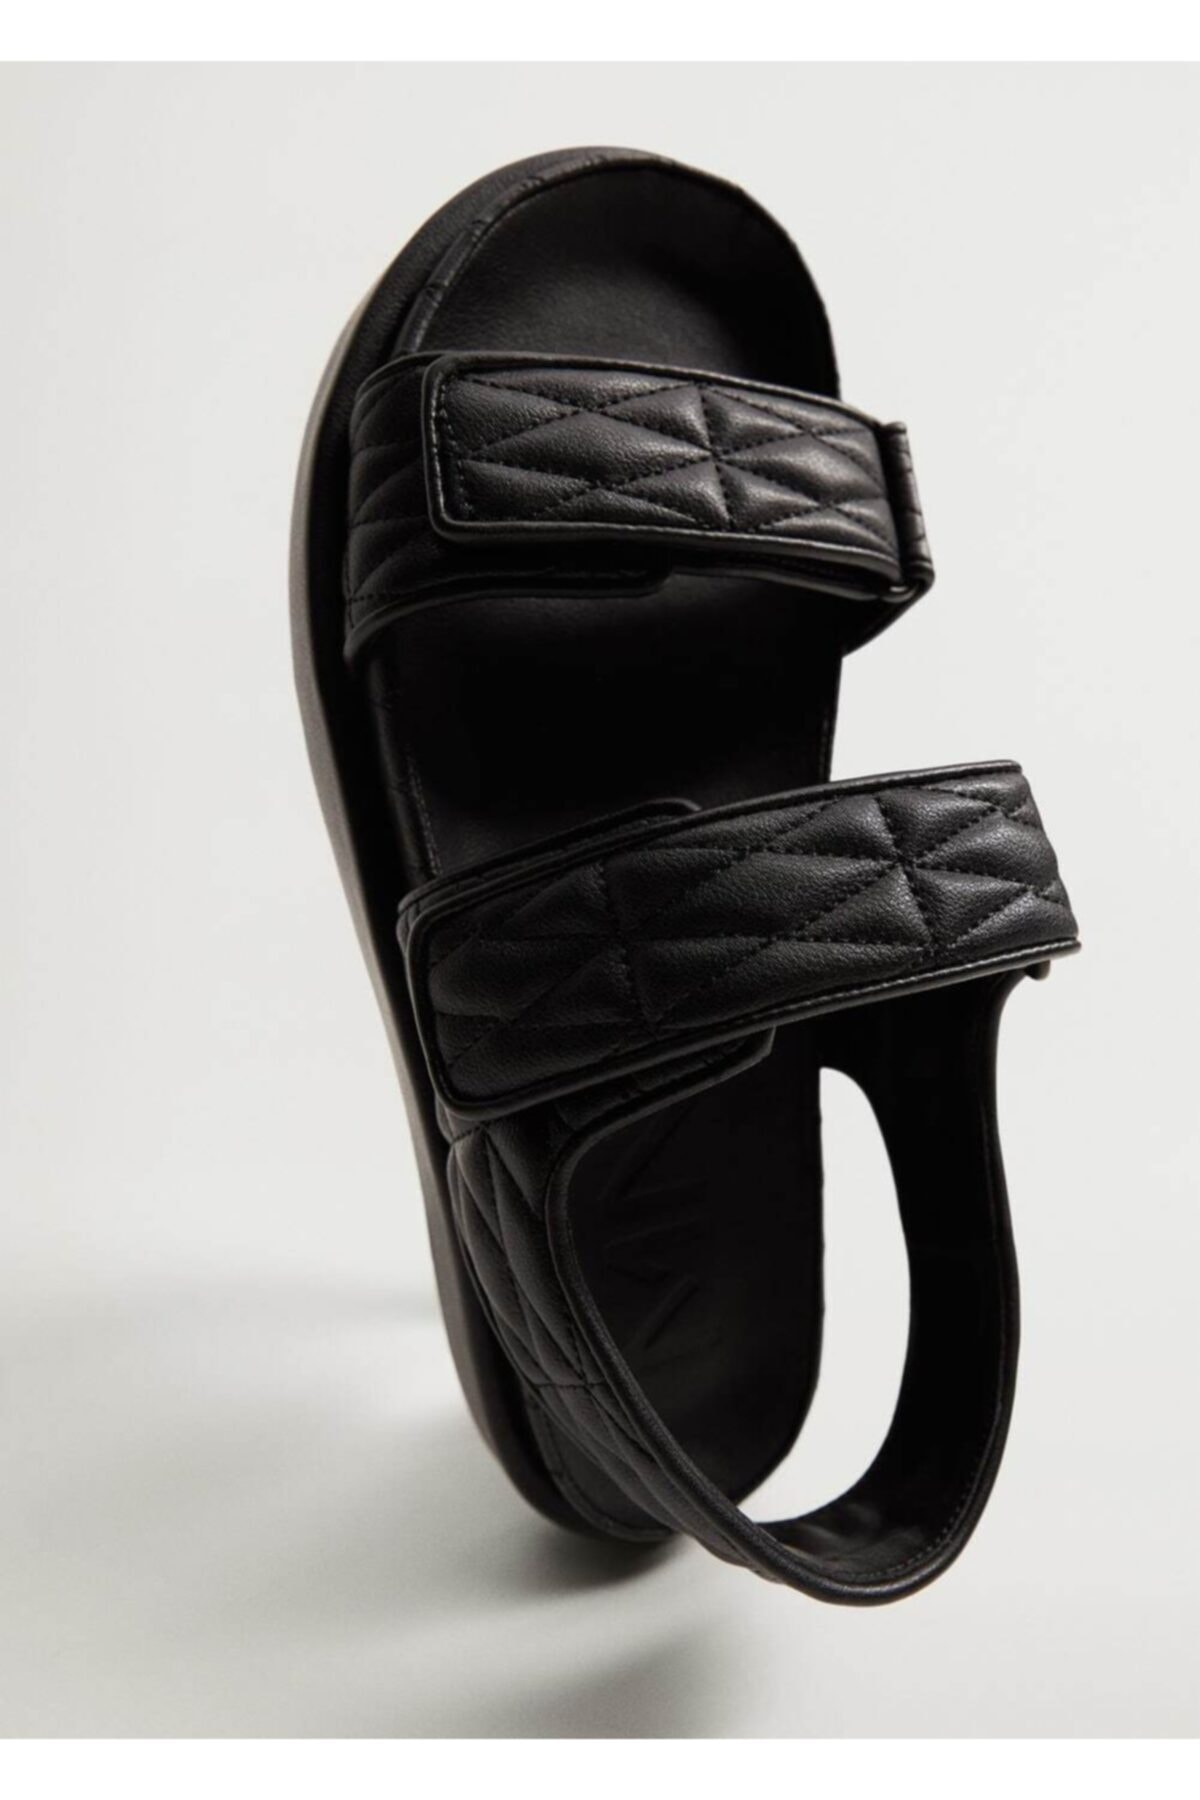 MANGO Woman Kadın Siyah Kapitone Bantlı Sandalet 1